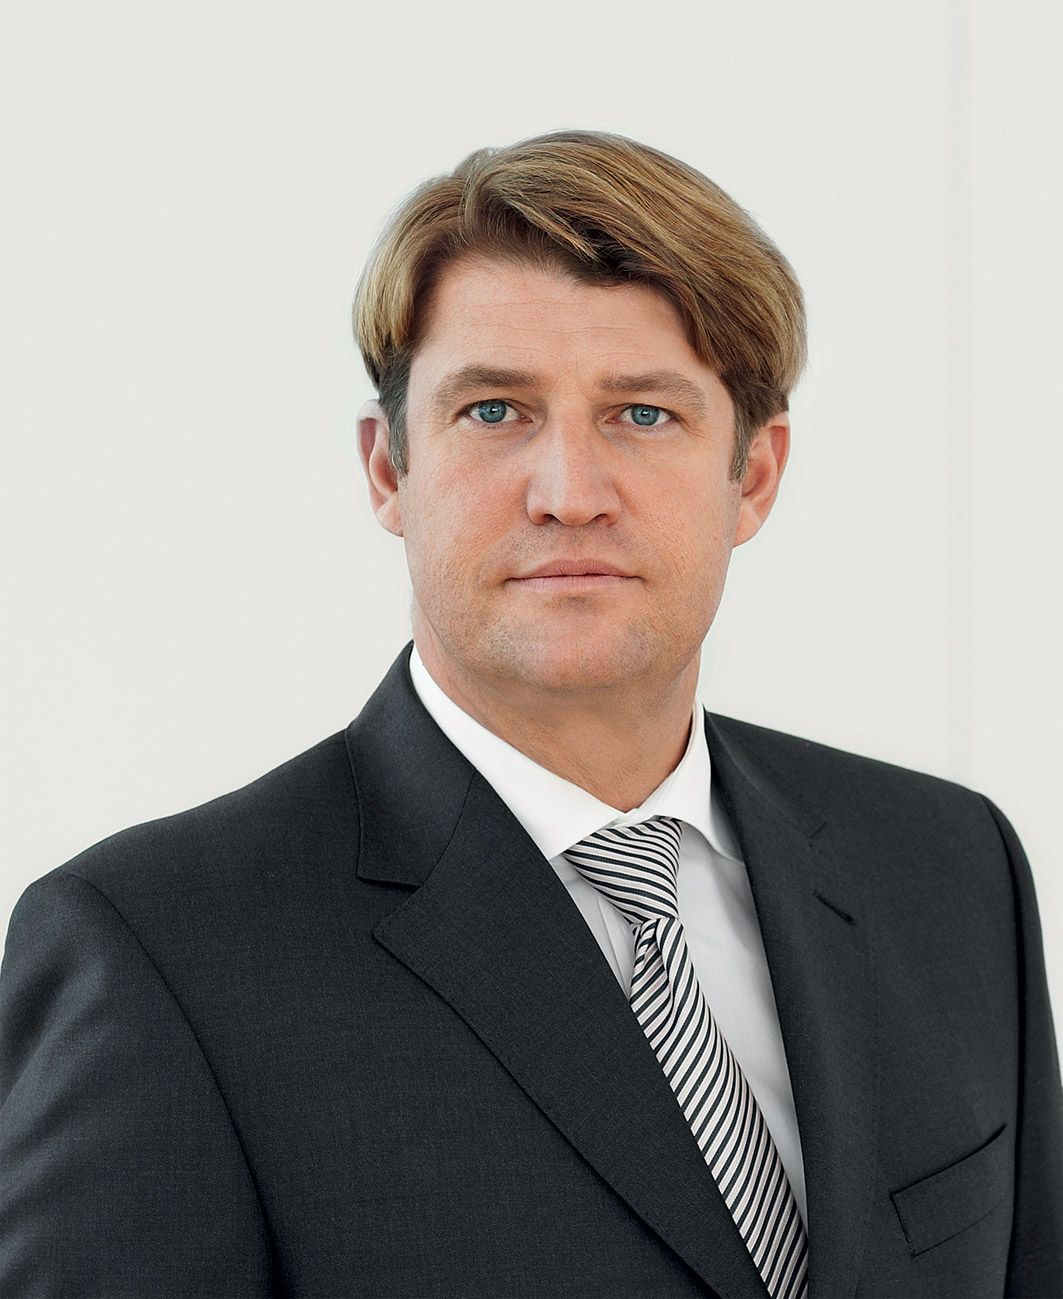 Commerzbank / Jochen Klösges